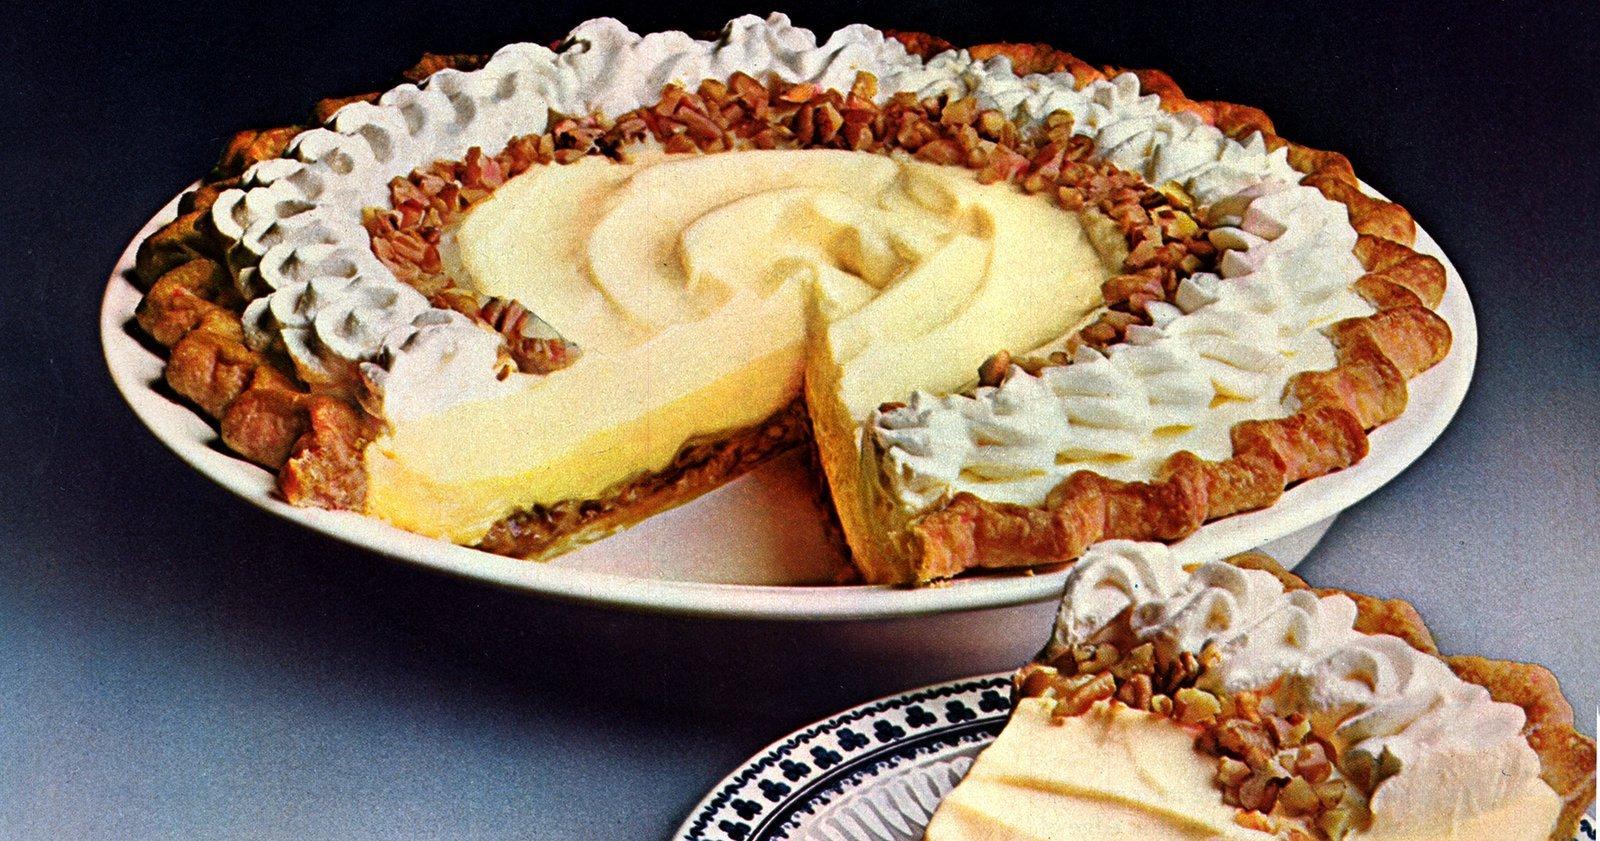 Holiday praline delight pie - Vintage recipe (1970s)